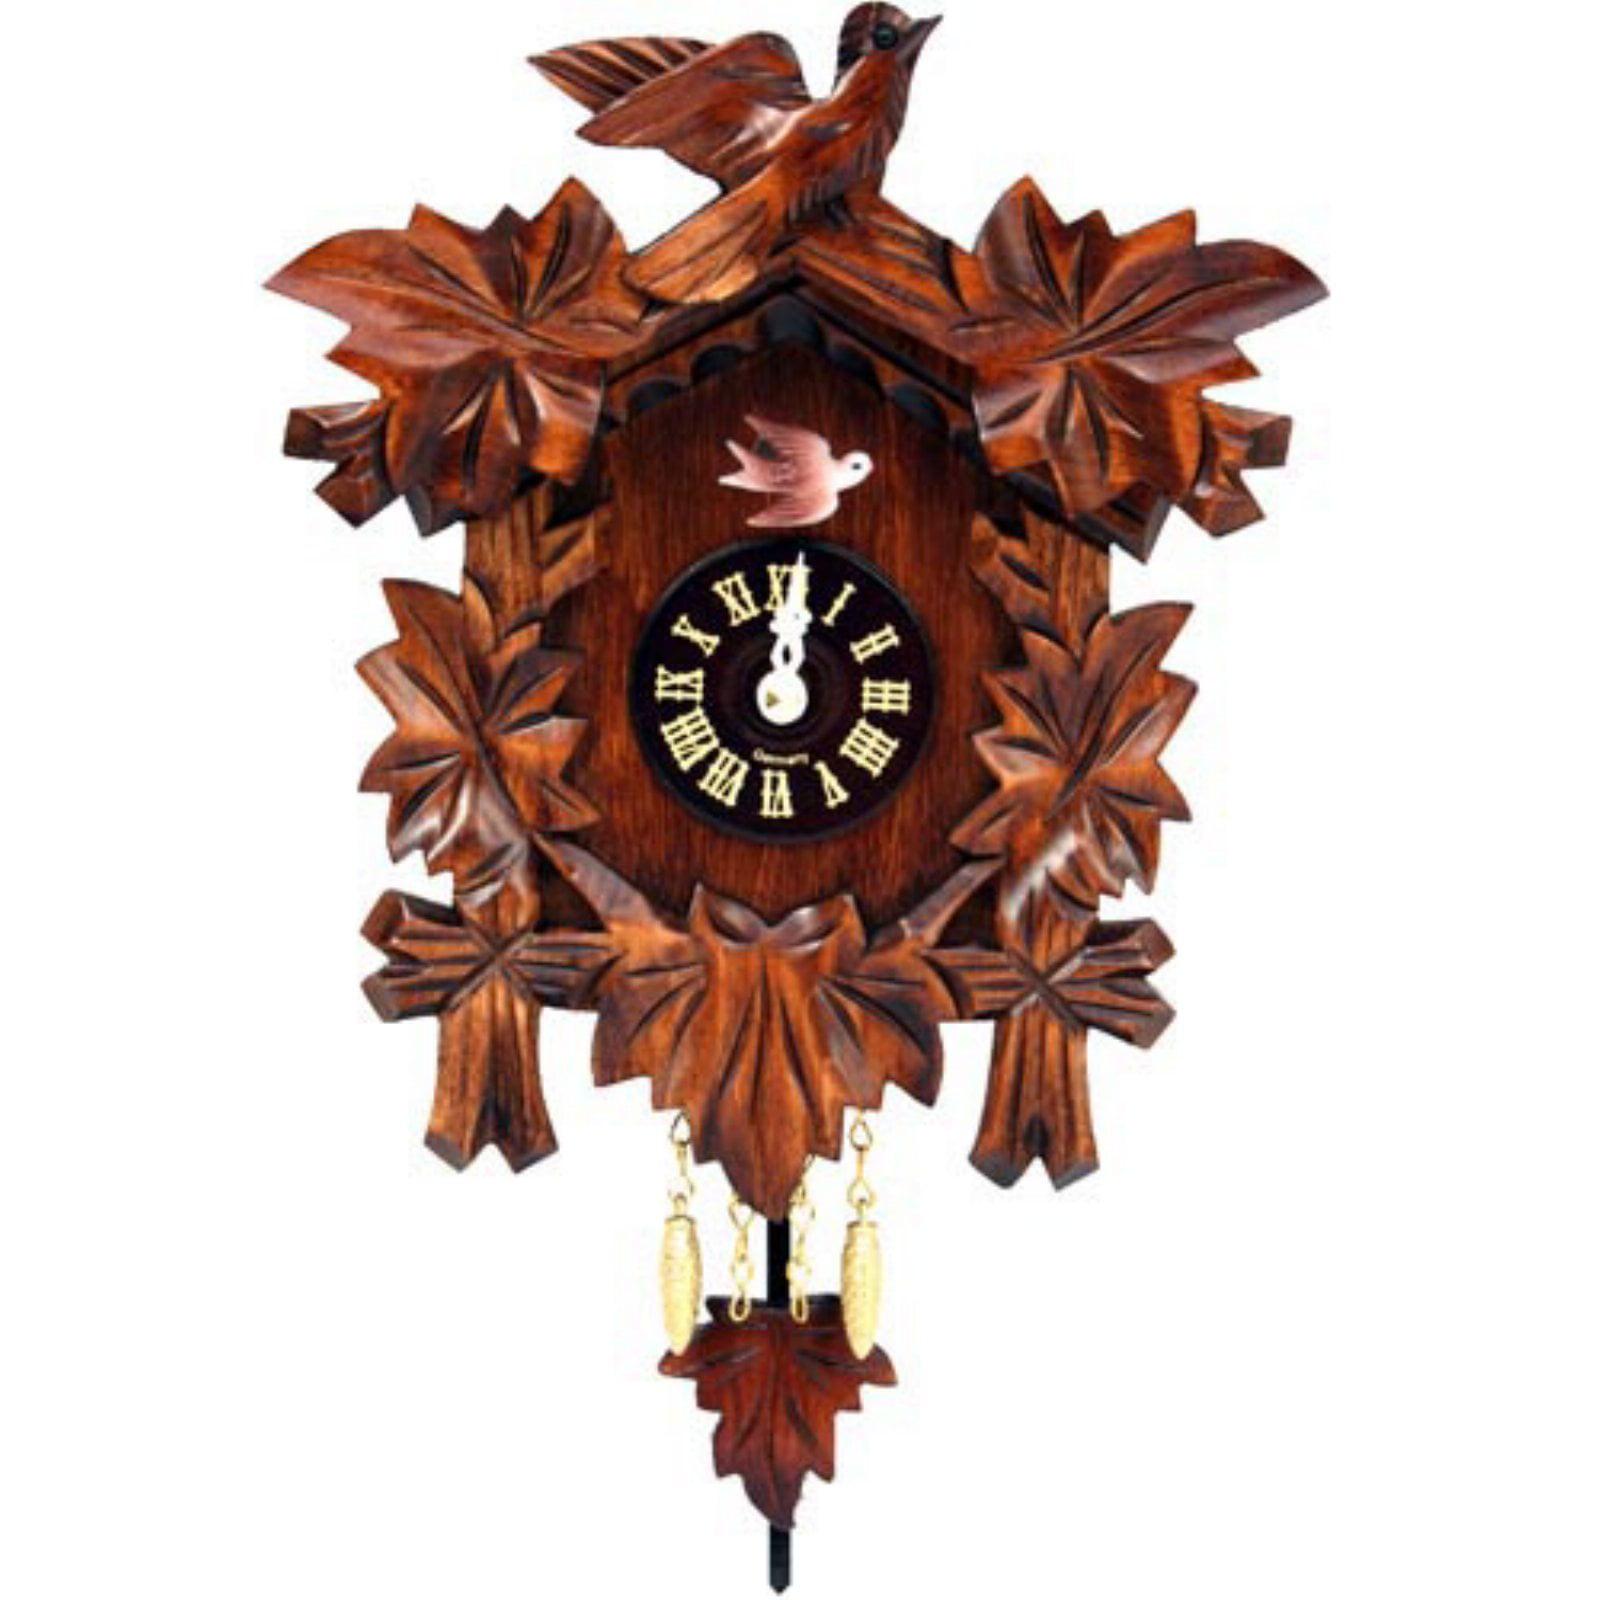 Black Forest Bird and Leaf Cuckoo Clock by Alexander Taron